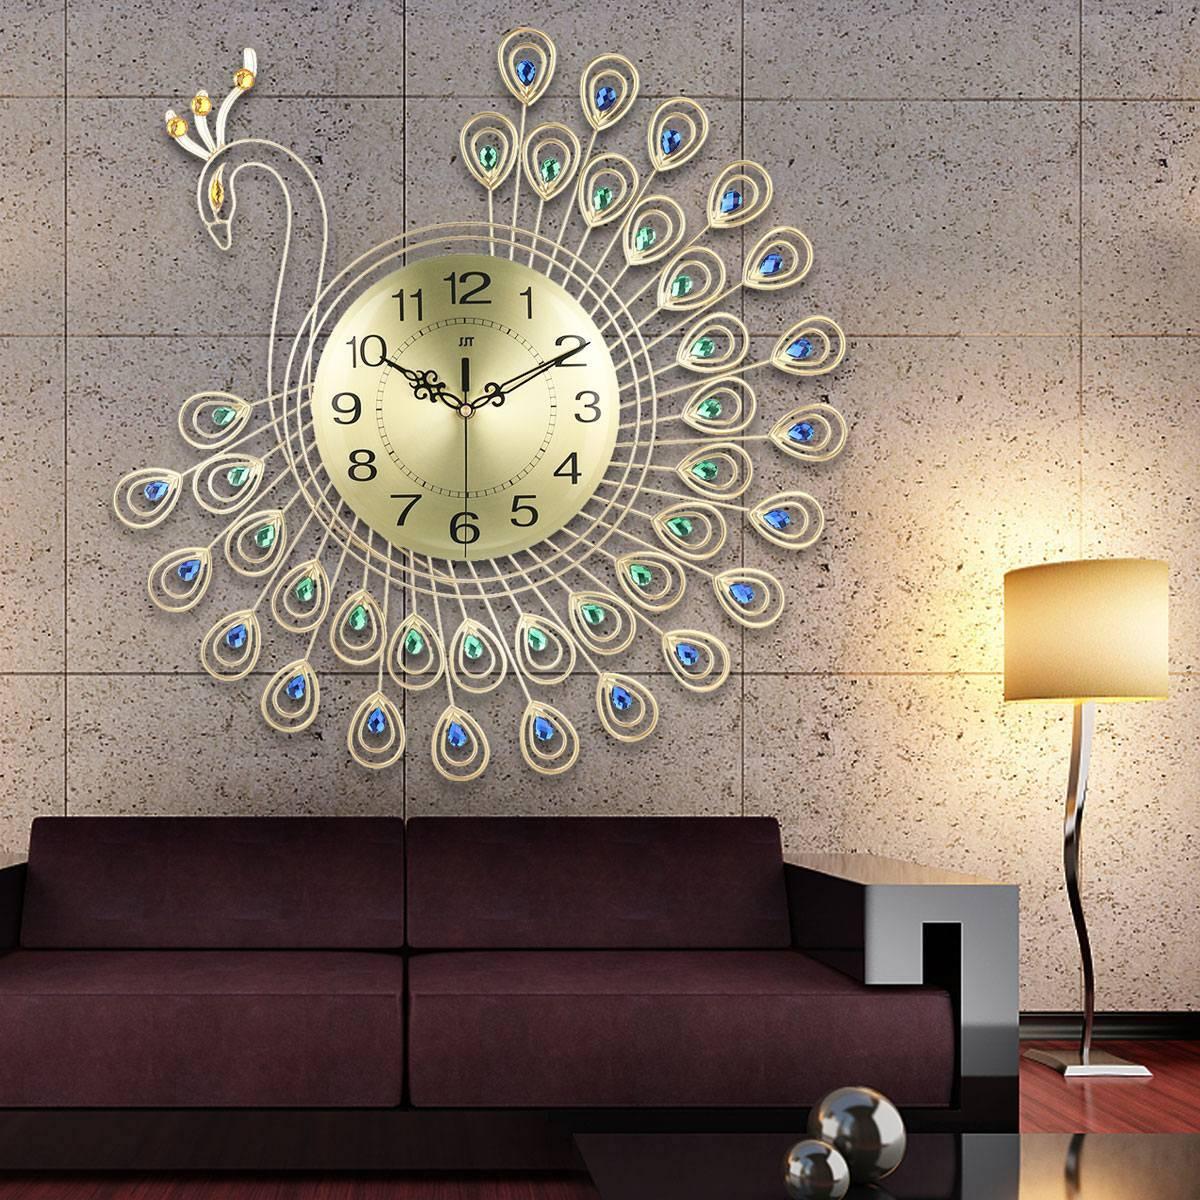 Large Gold Plastic Peacock Feather Wall Clock – DIY Clocks Ideas